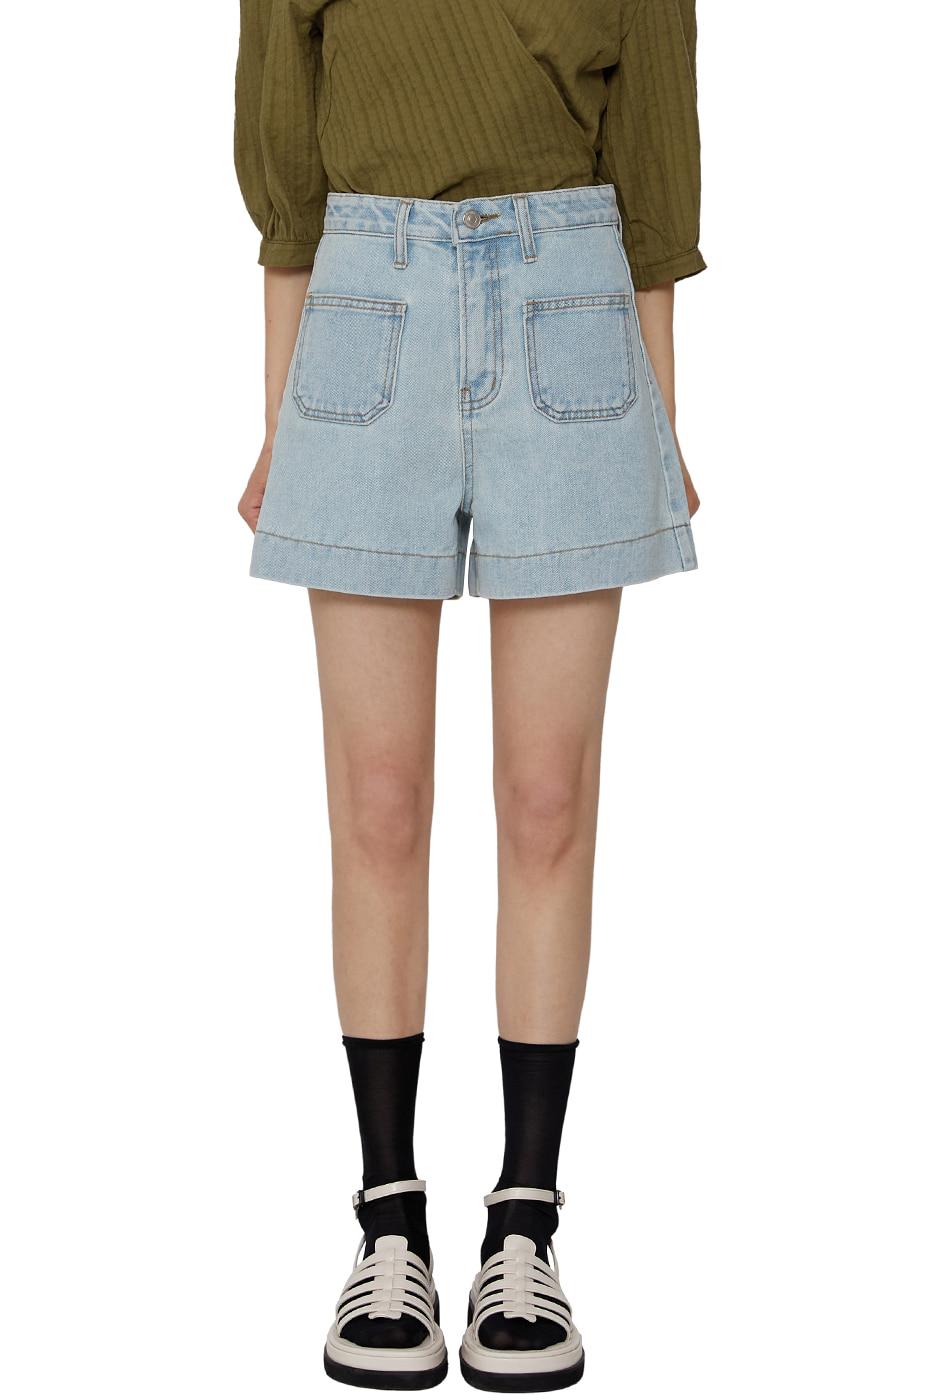 Baked pocket denim shorts